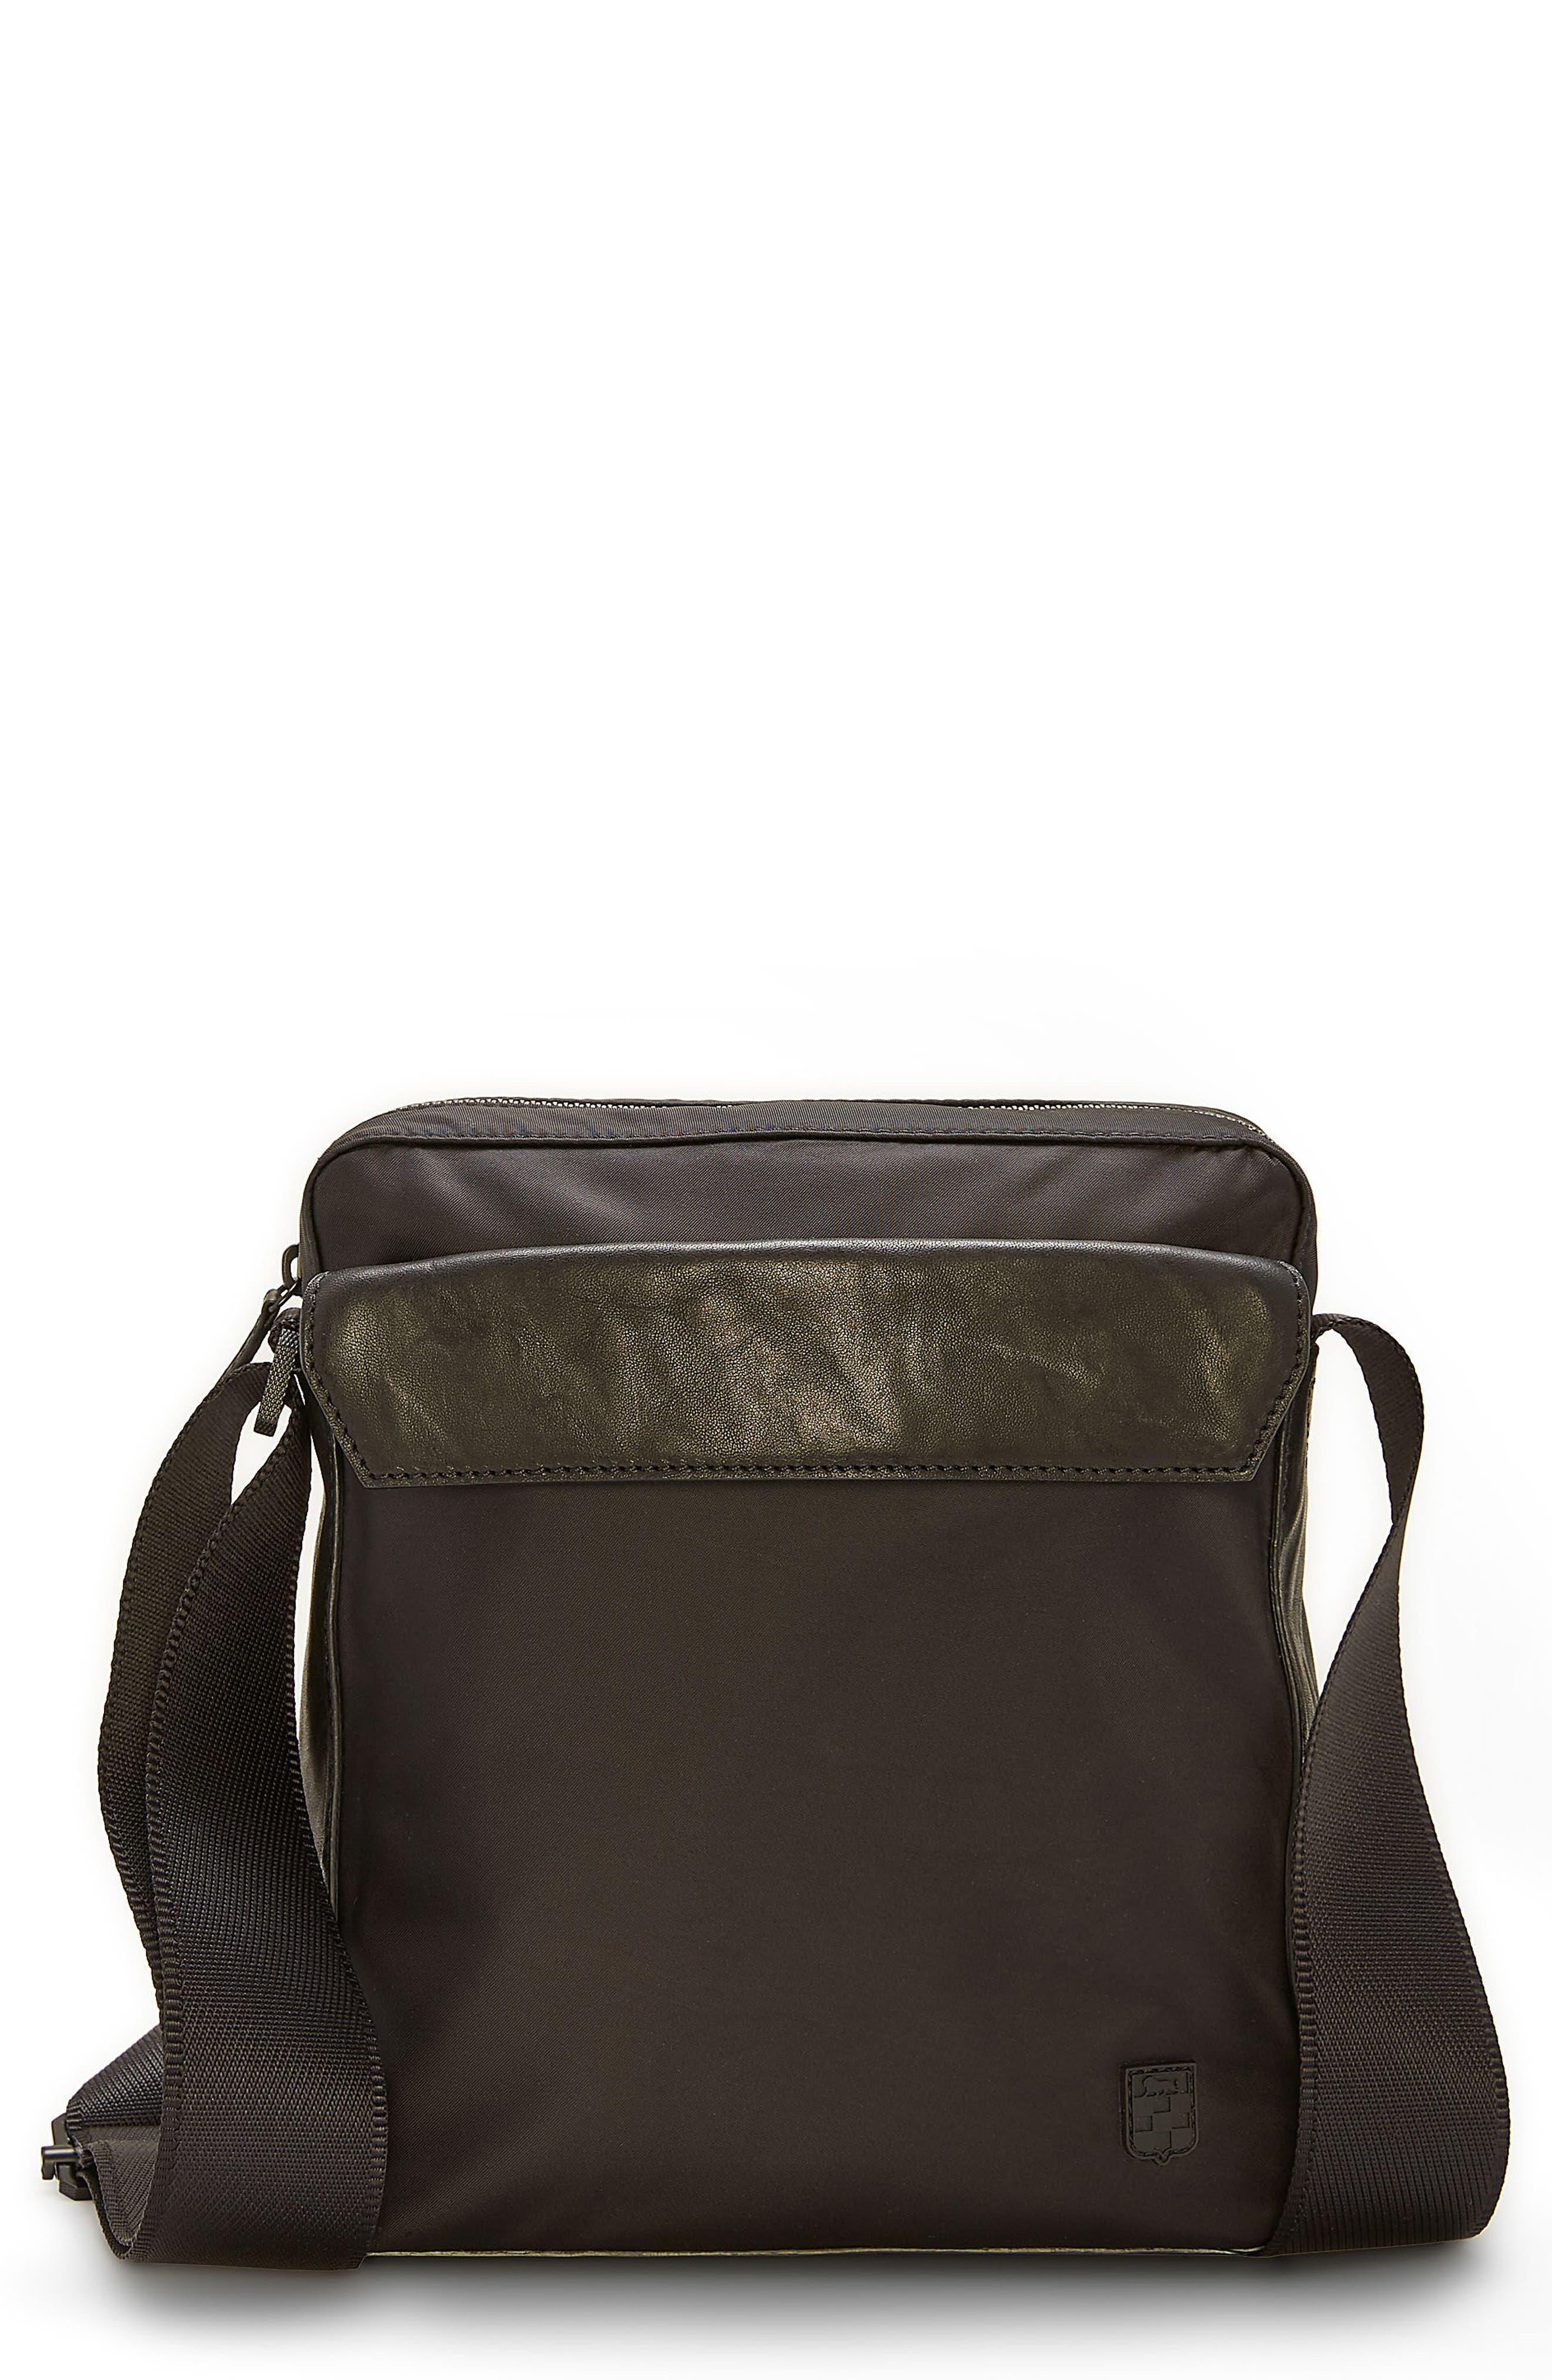 Basin Crossbody Bag,                         Main,                         color, Black